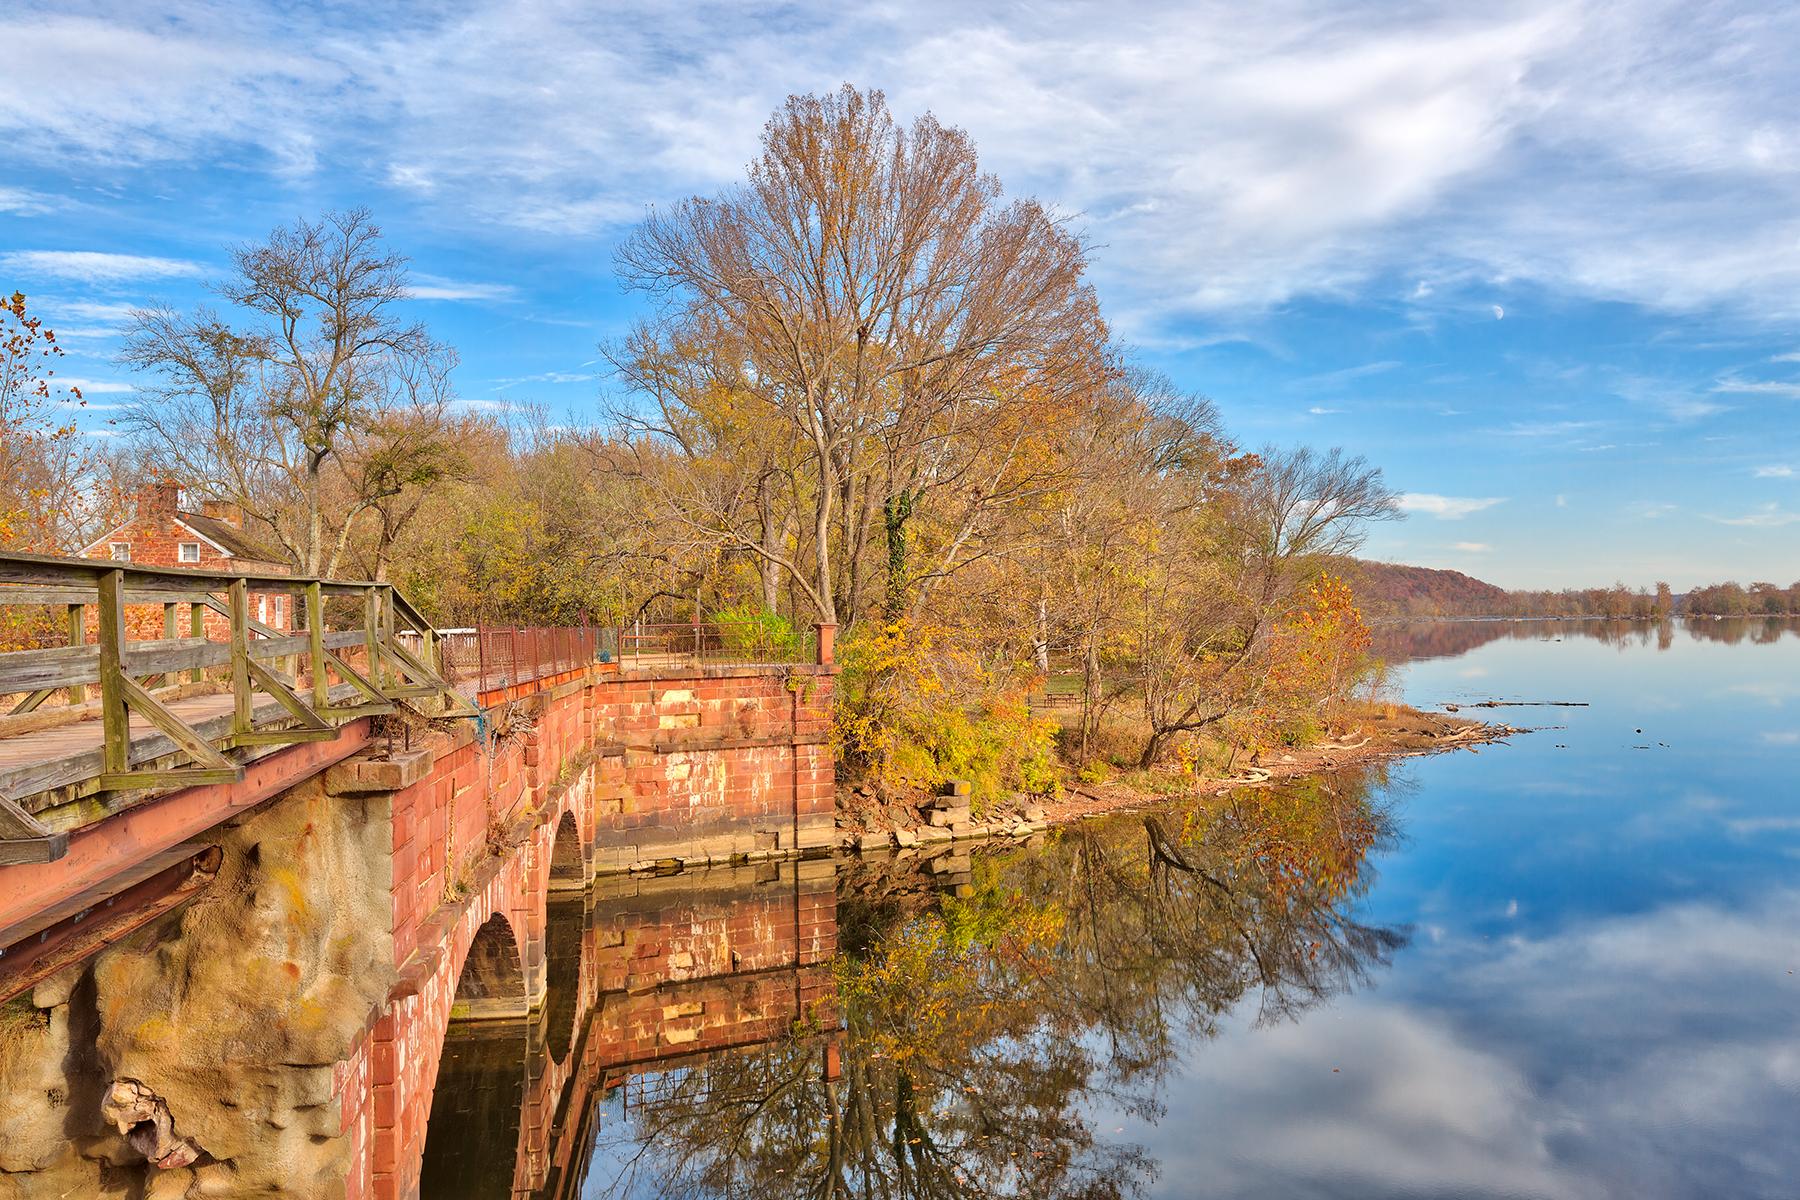 Autumn aqueduct decay - hdr photo